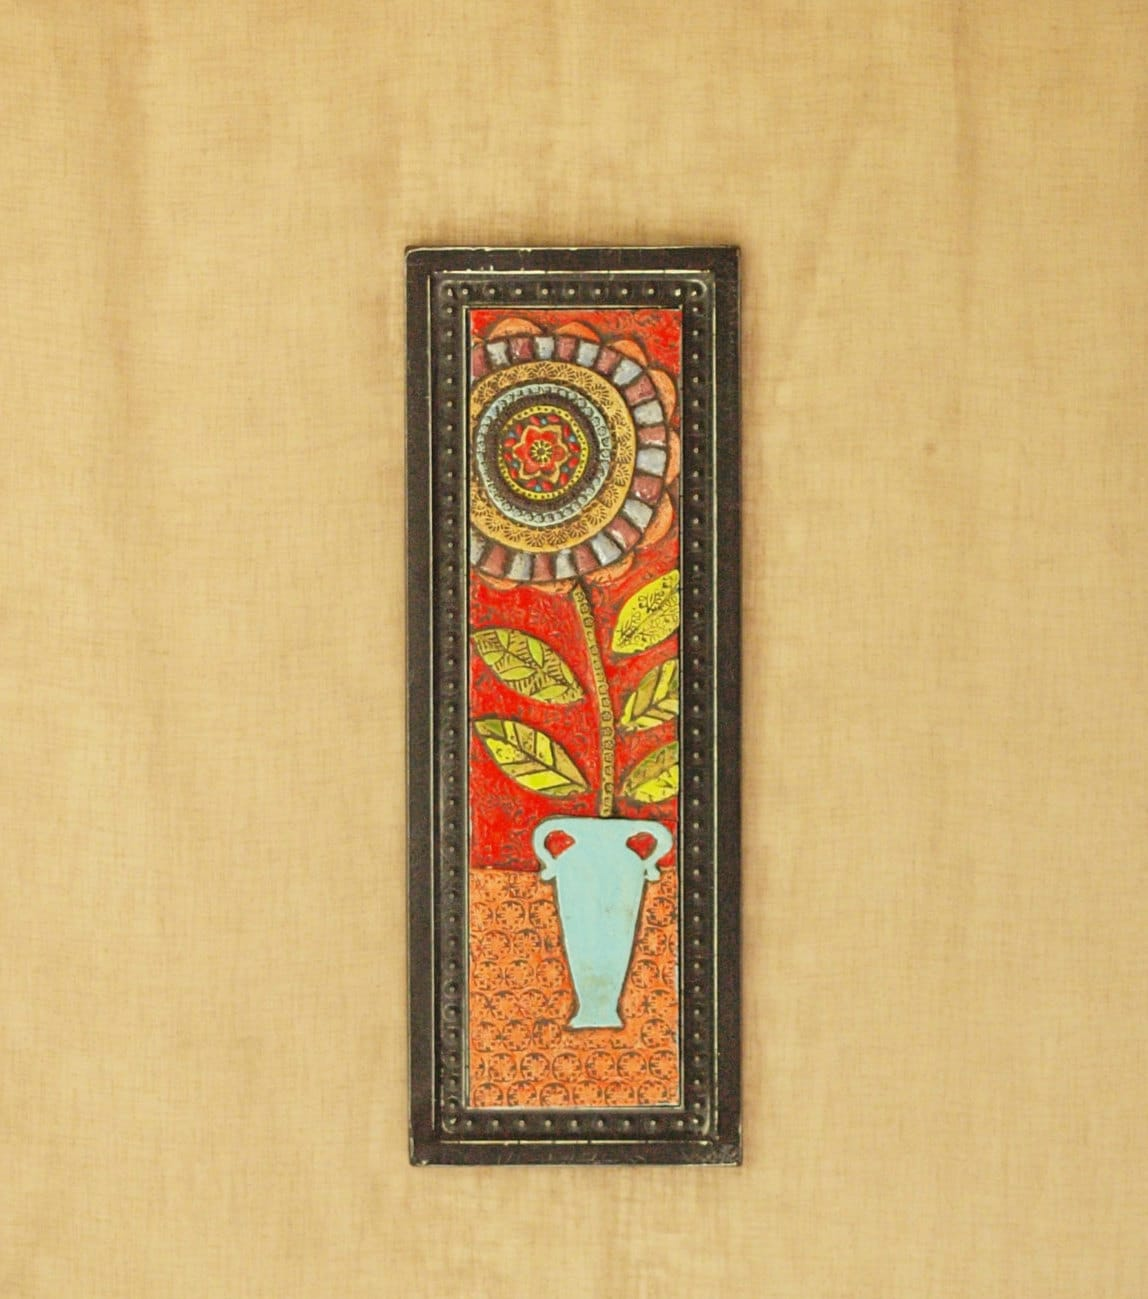 Wall Art Mosaic Wall Art Ceramic Tile Art Blossom in Blue Vase